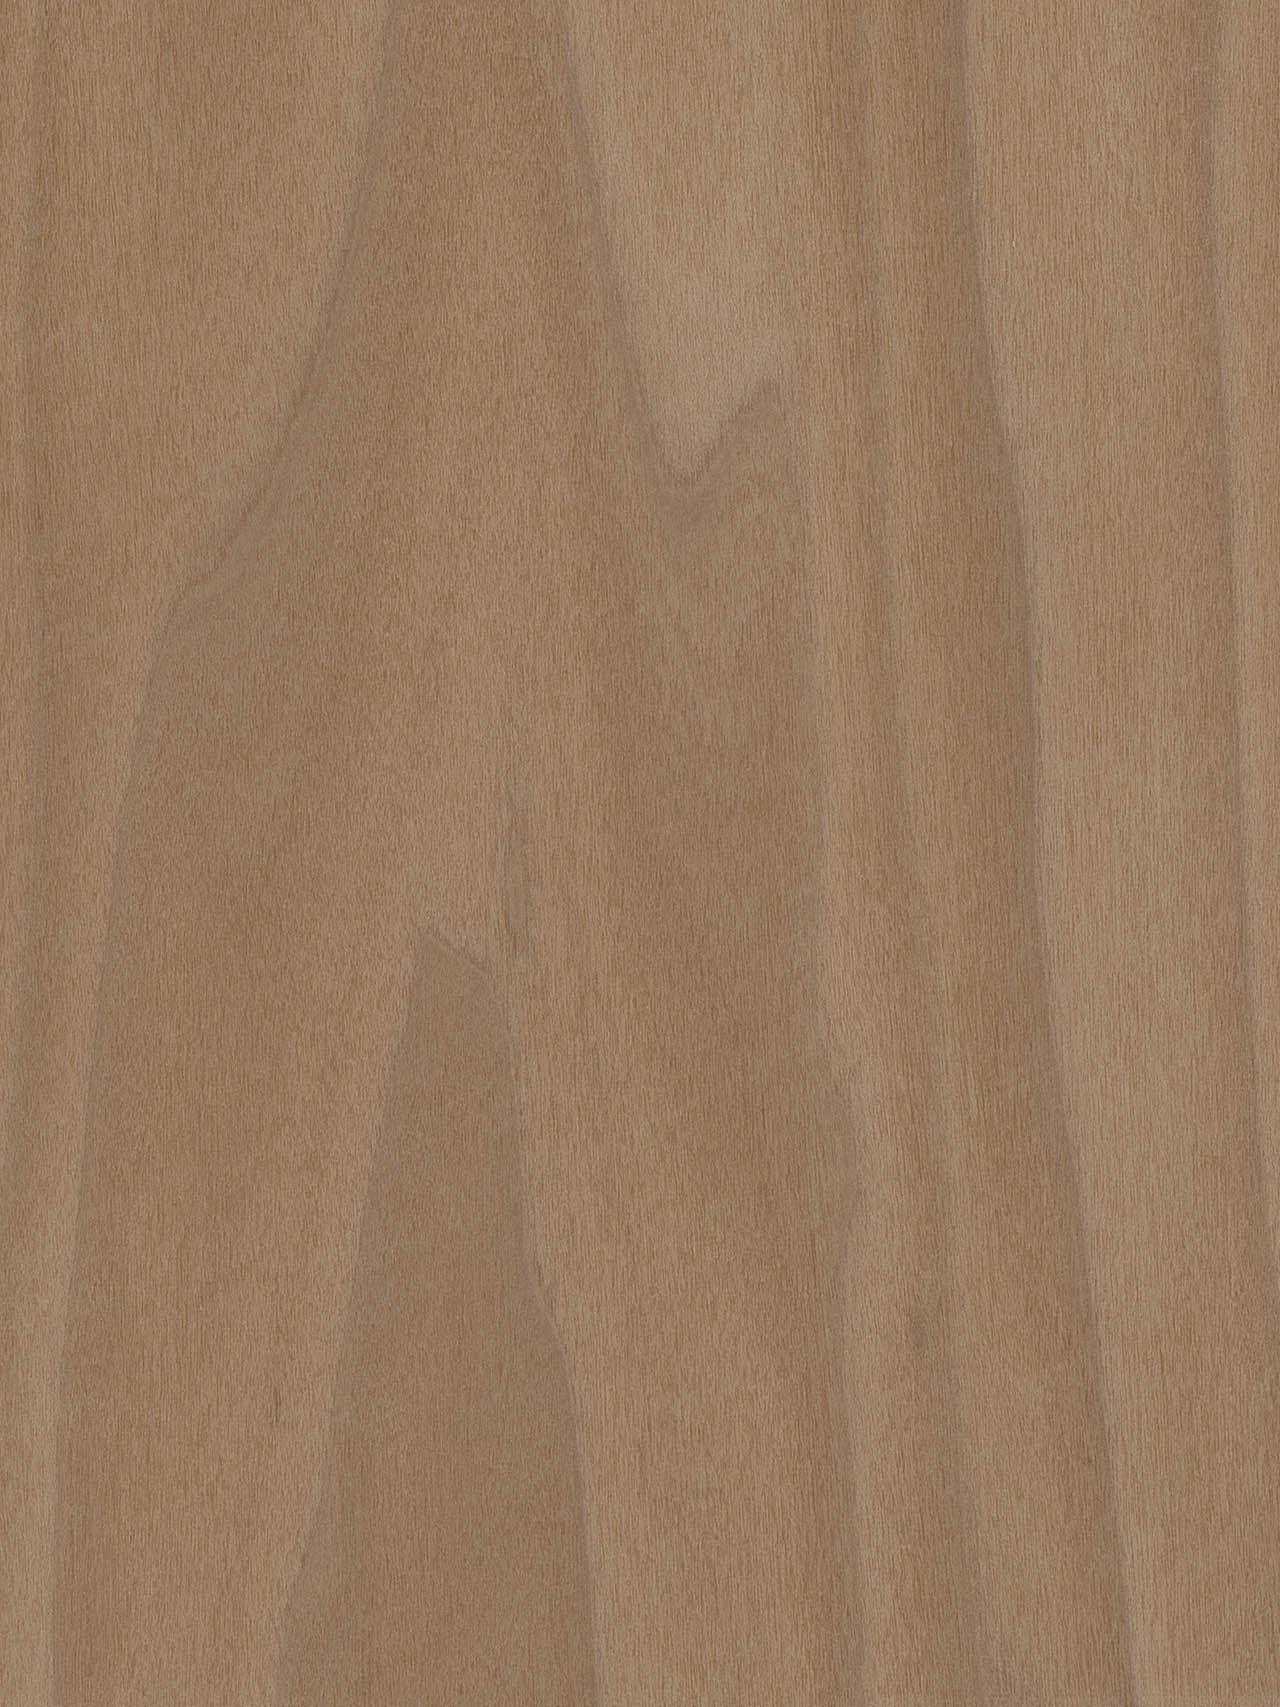 Chapa de madera Tulipie Avellana MAF108 Losán